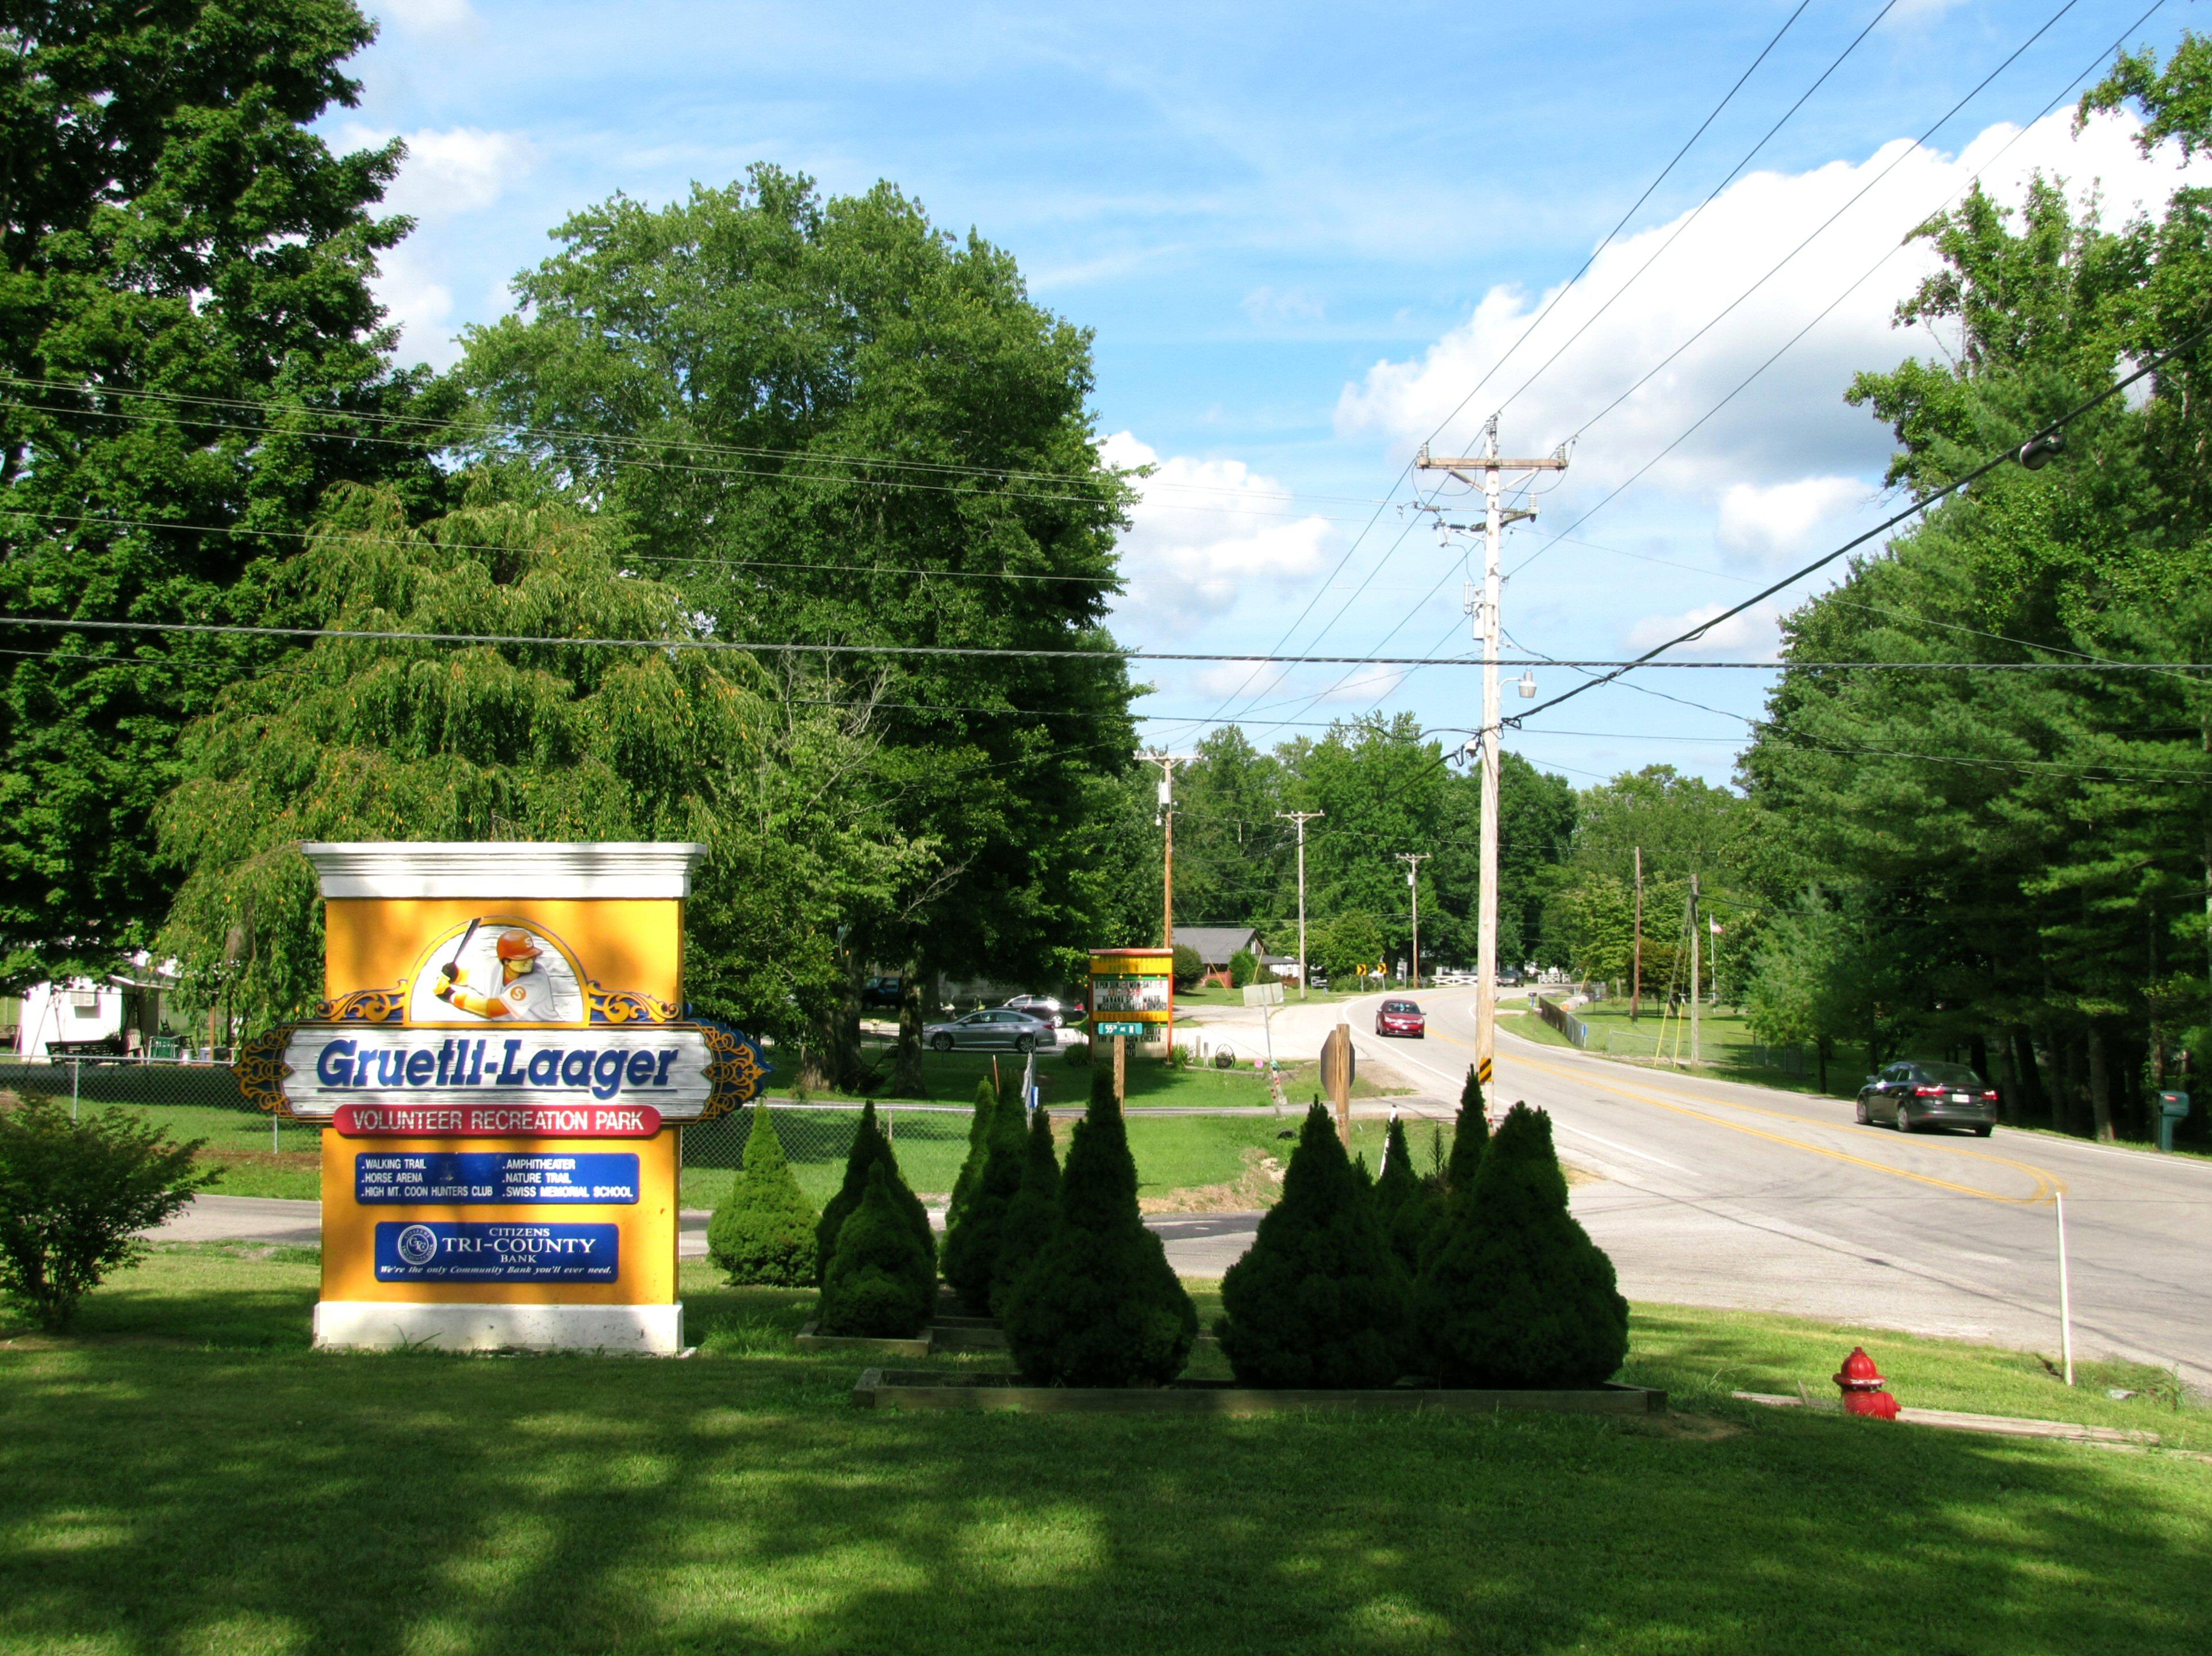 Gruetli-Laager, Tennessee - Wikipedia